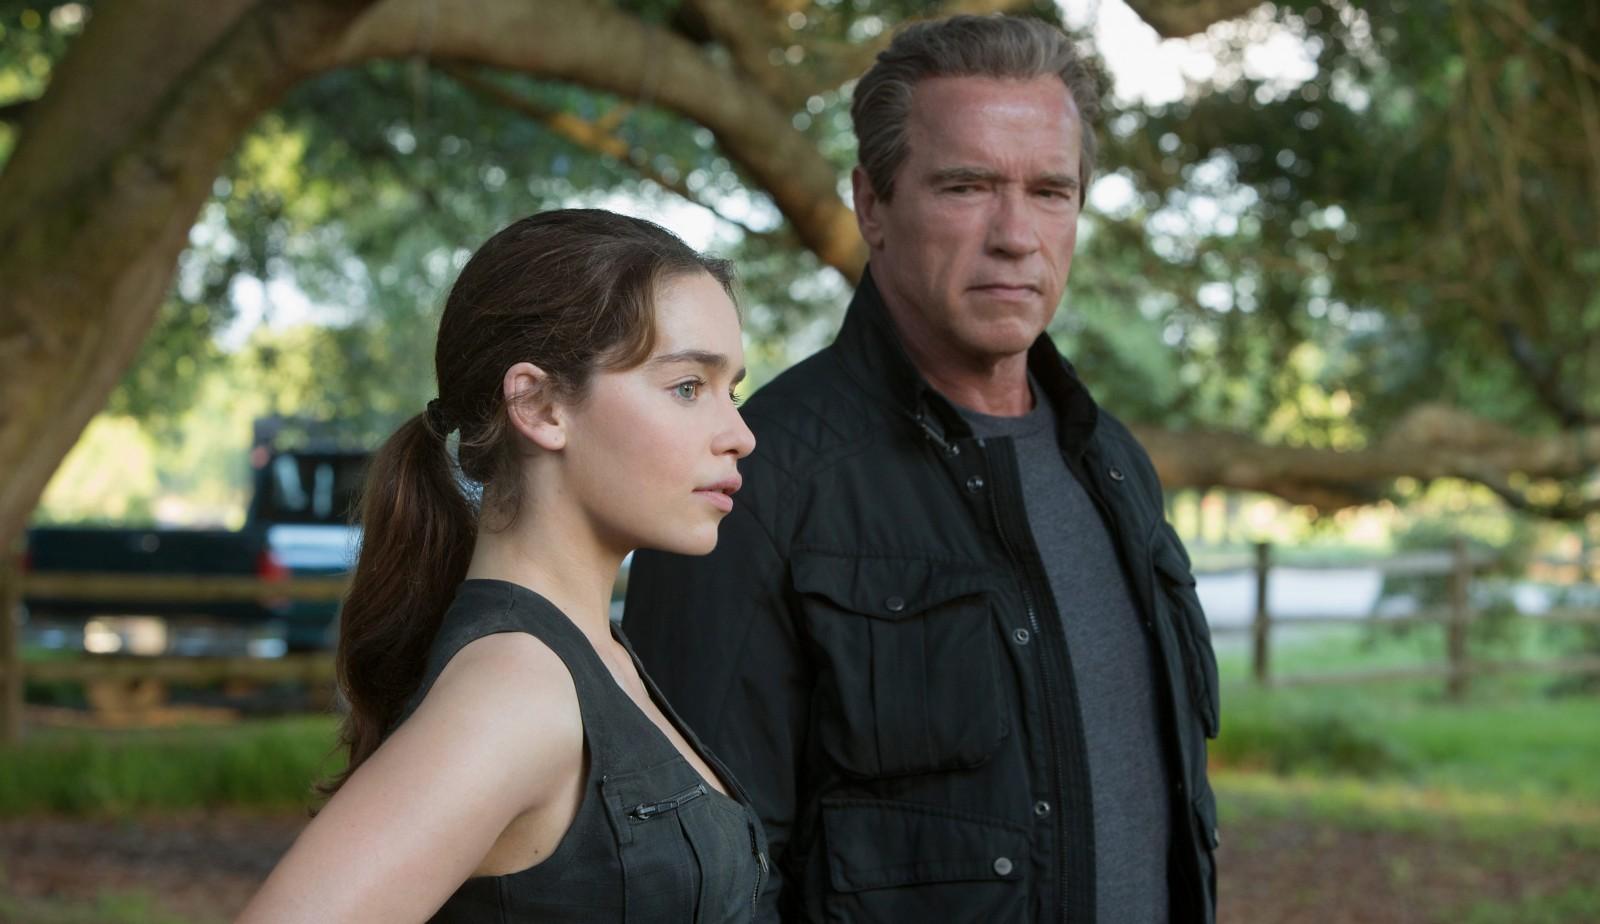 Emilia Clarke plays Sarah Connor and Arnold Schwarzenegger returns as the Terminator in 'Terminator: Genisys.'